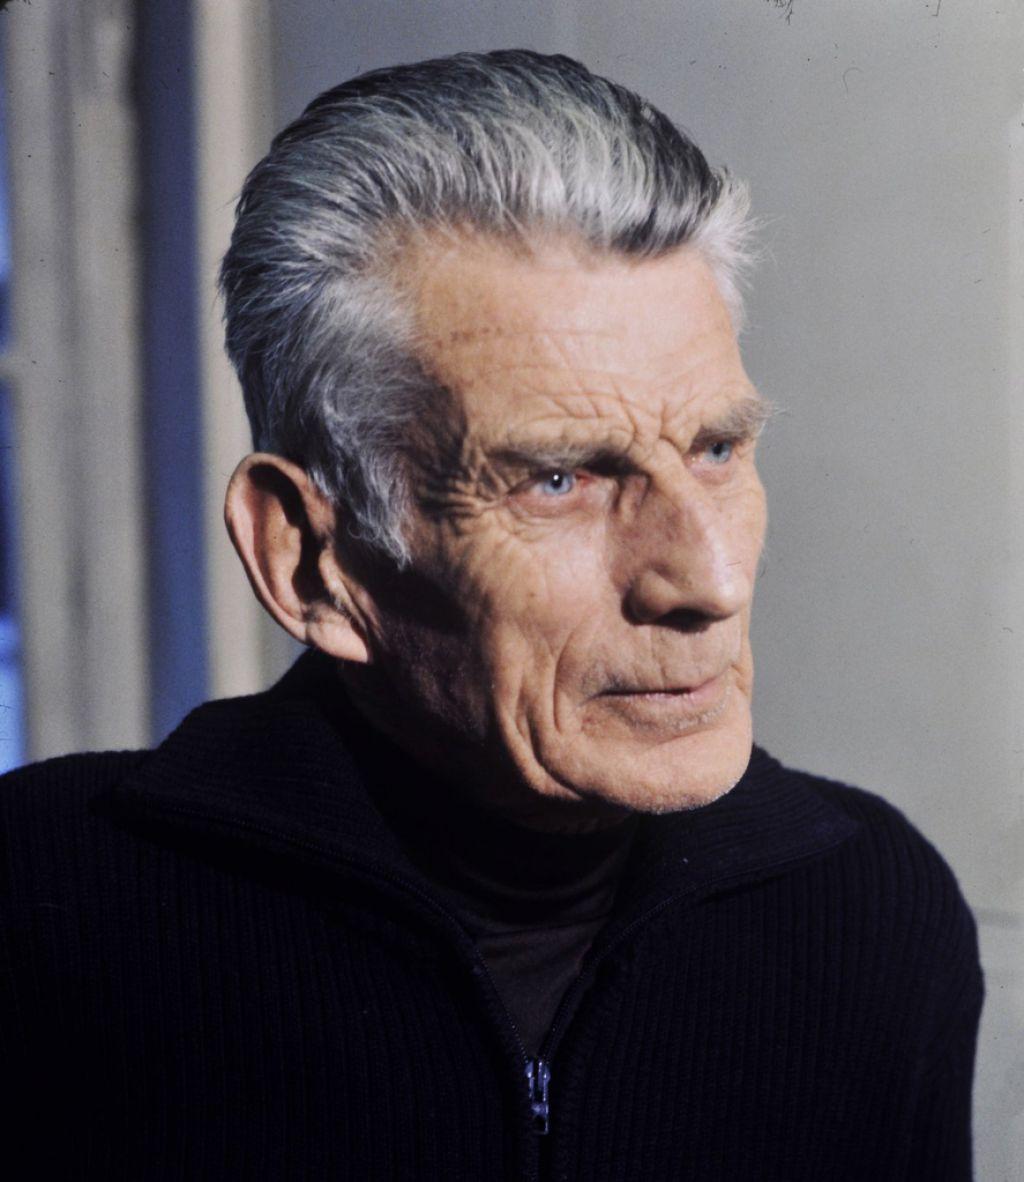 Samuel Beckett in inventivno osmišljanje absurda